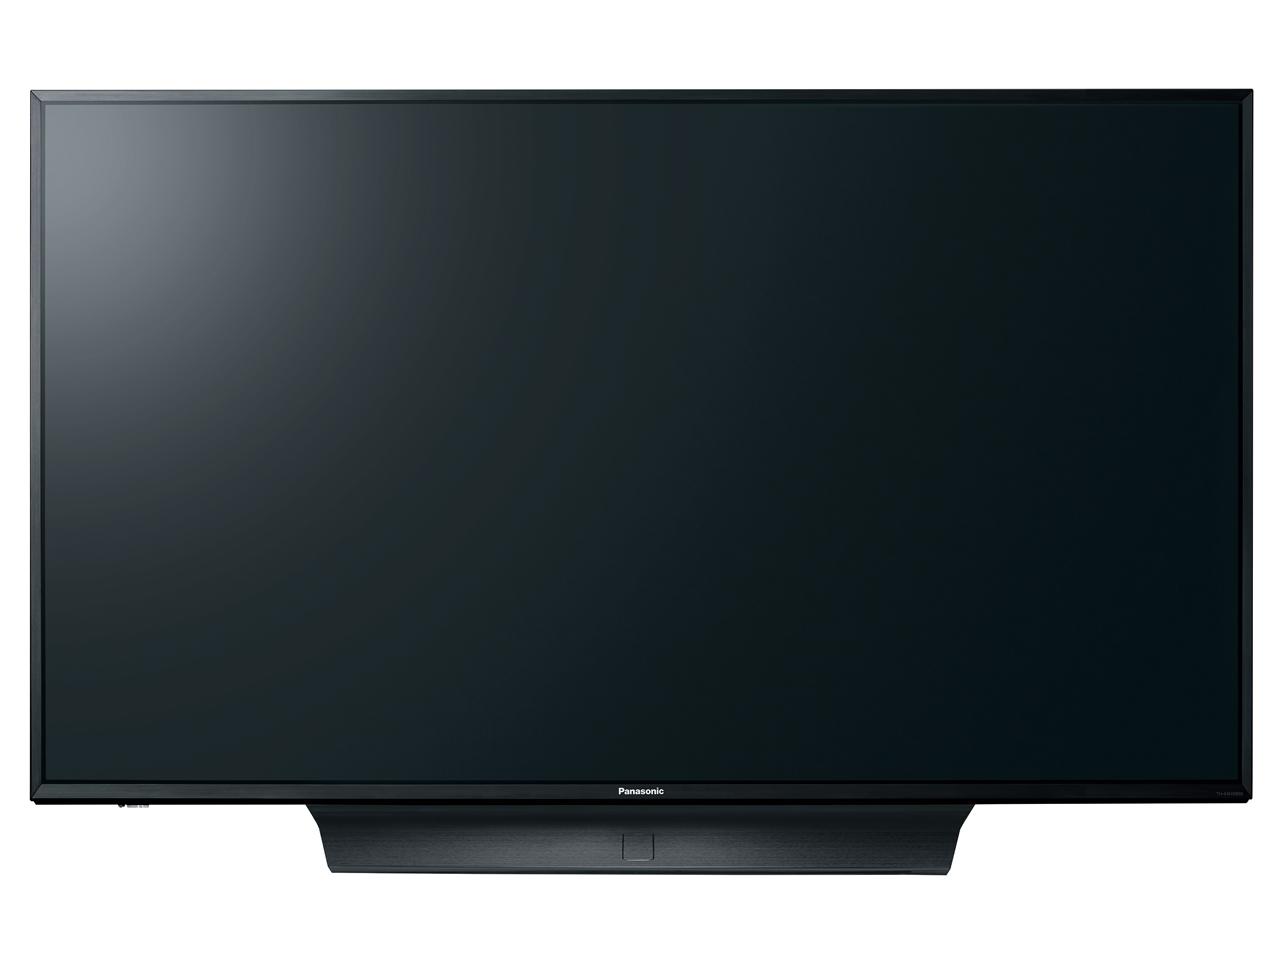 VIERA TH-43HX850 [43インチ] の製品画像